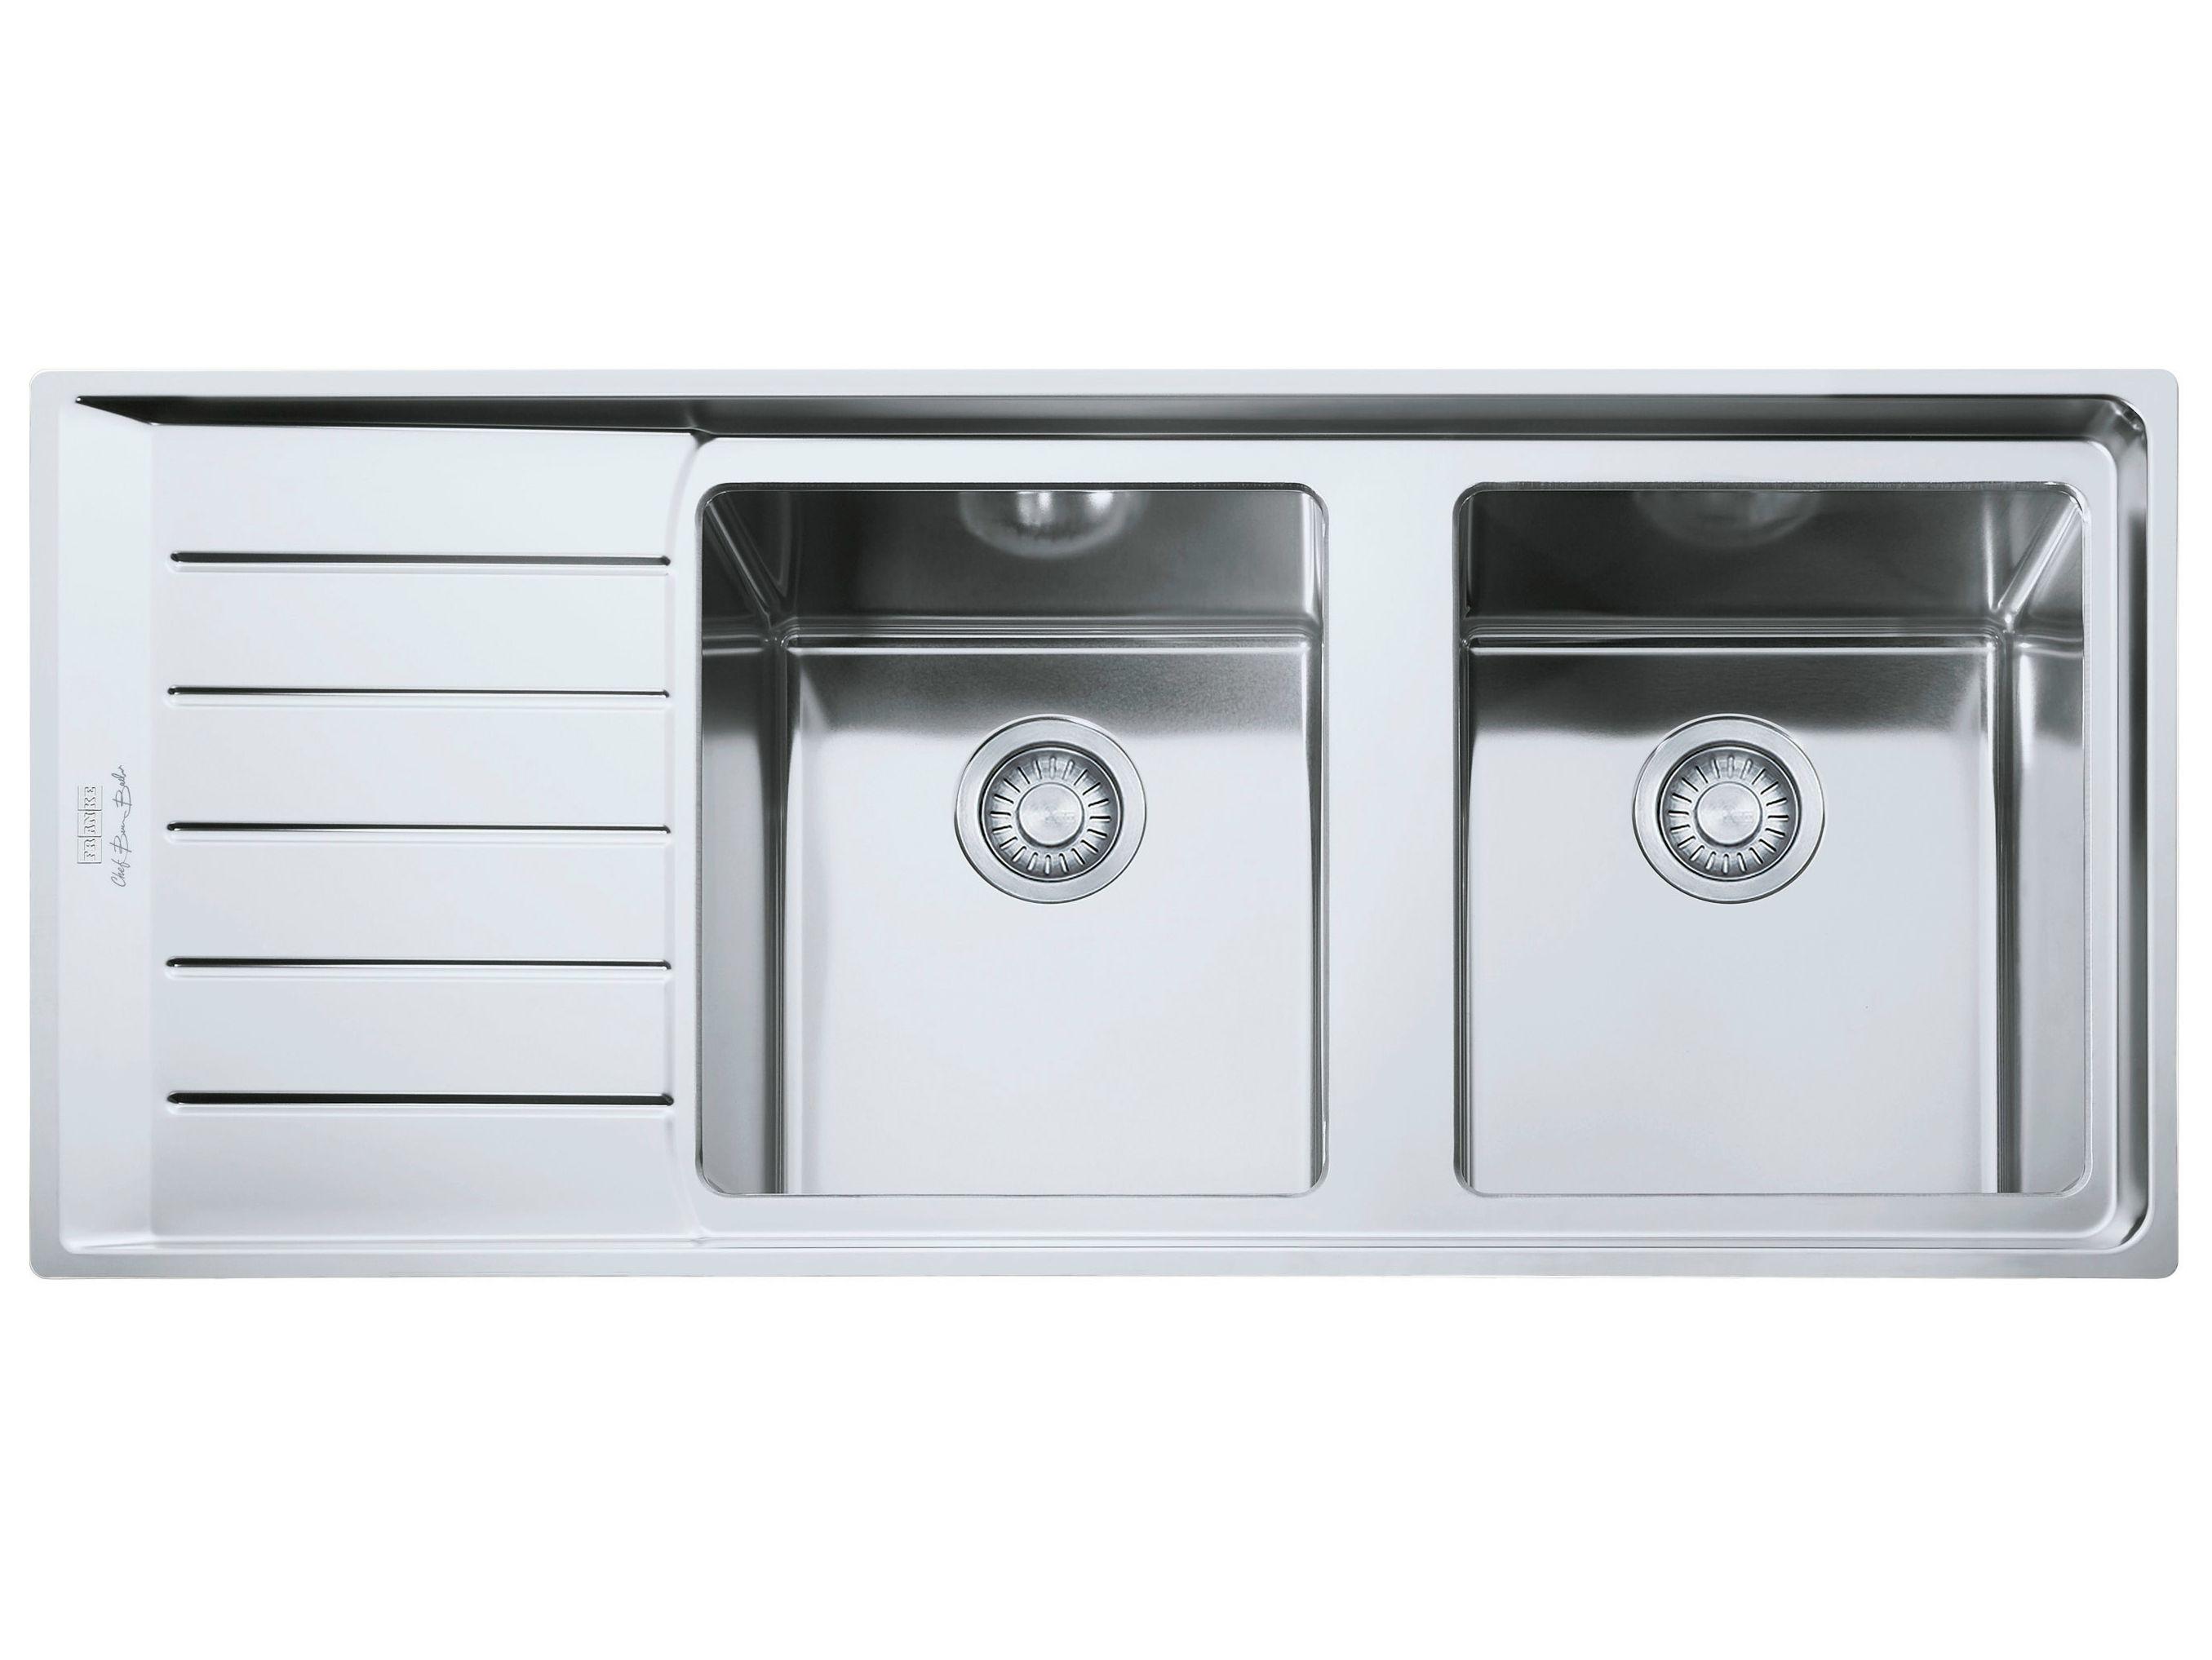 Npx 621 by franke design bruno barbieri - Lavabo cucina franke ...